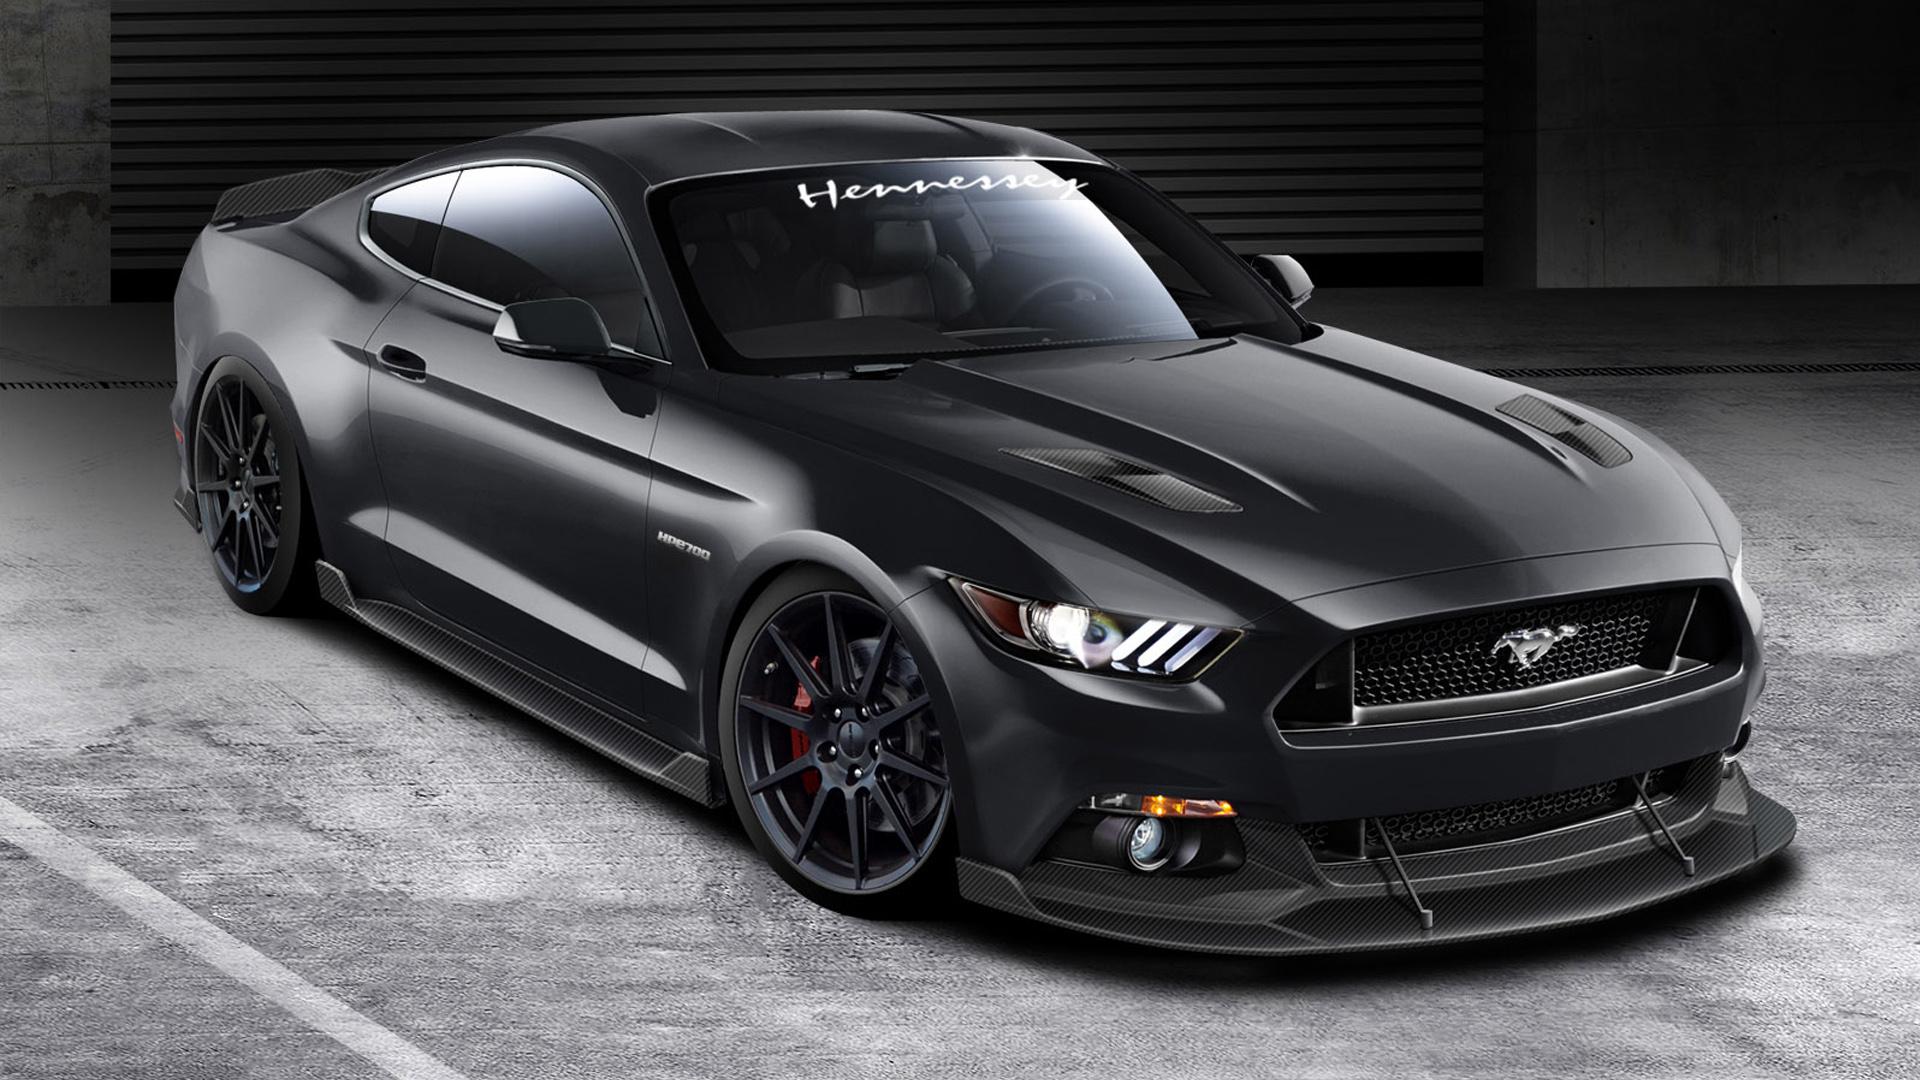 HD Mustang Wallpapers